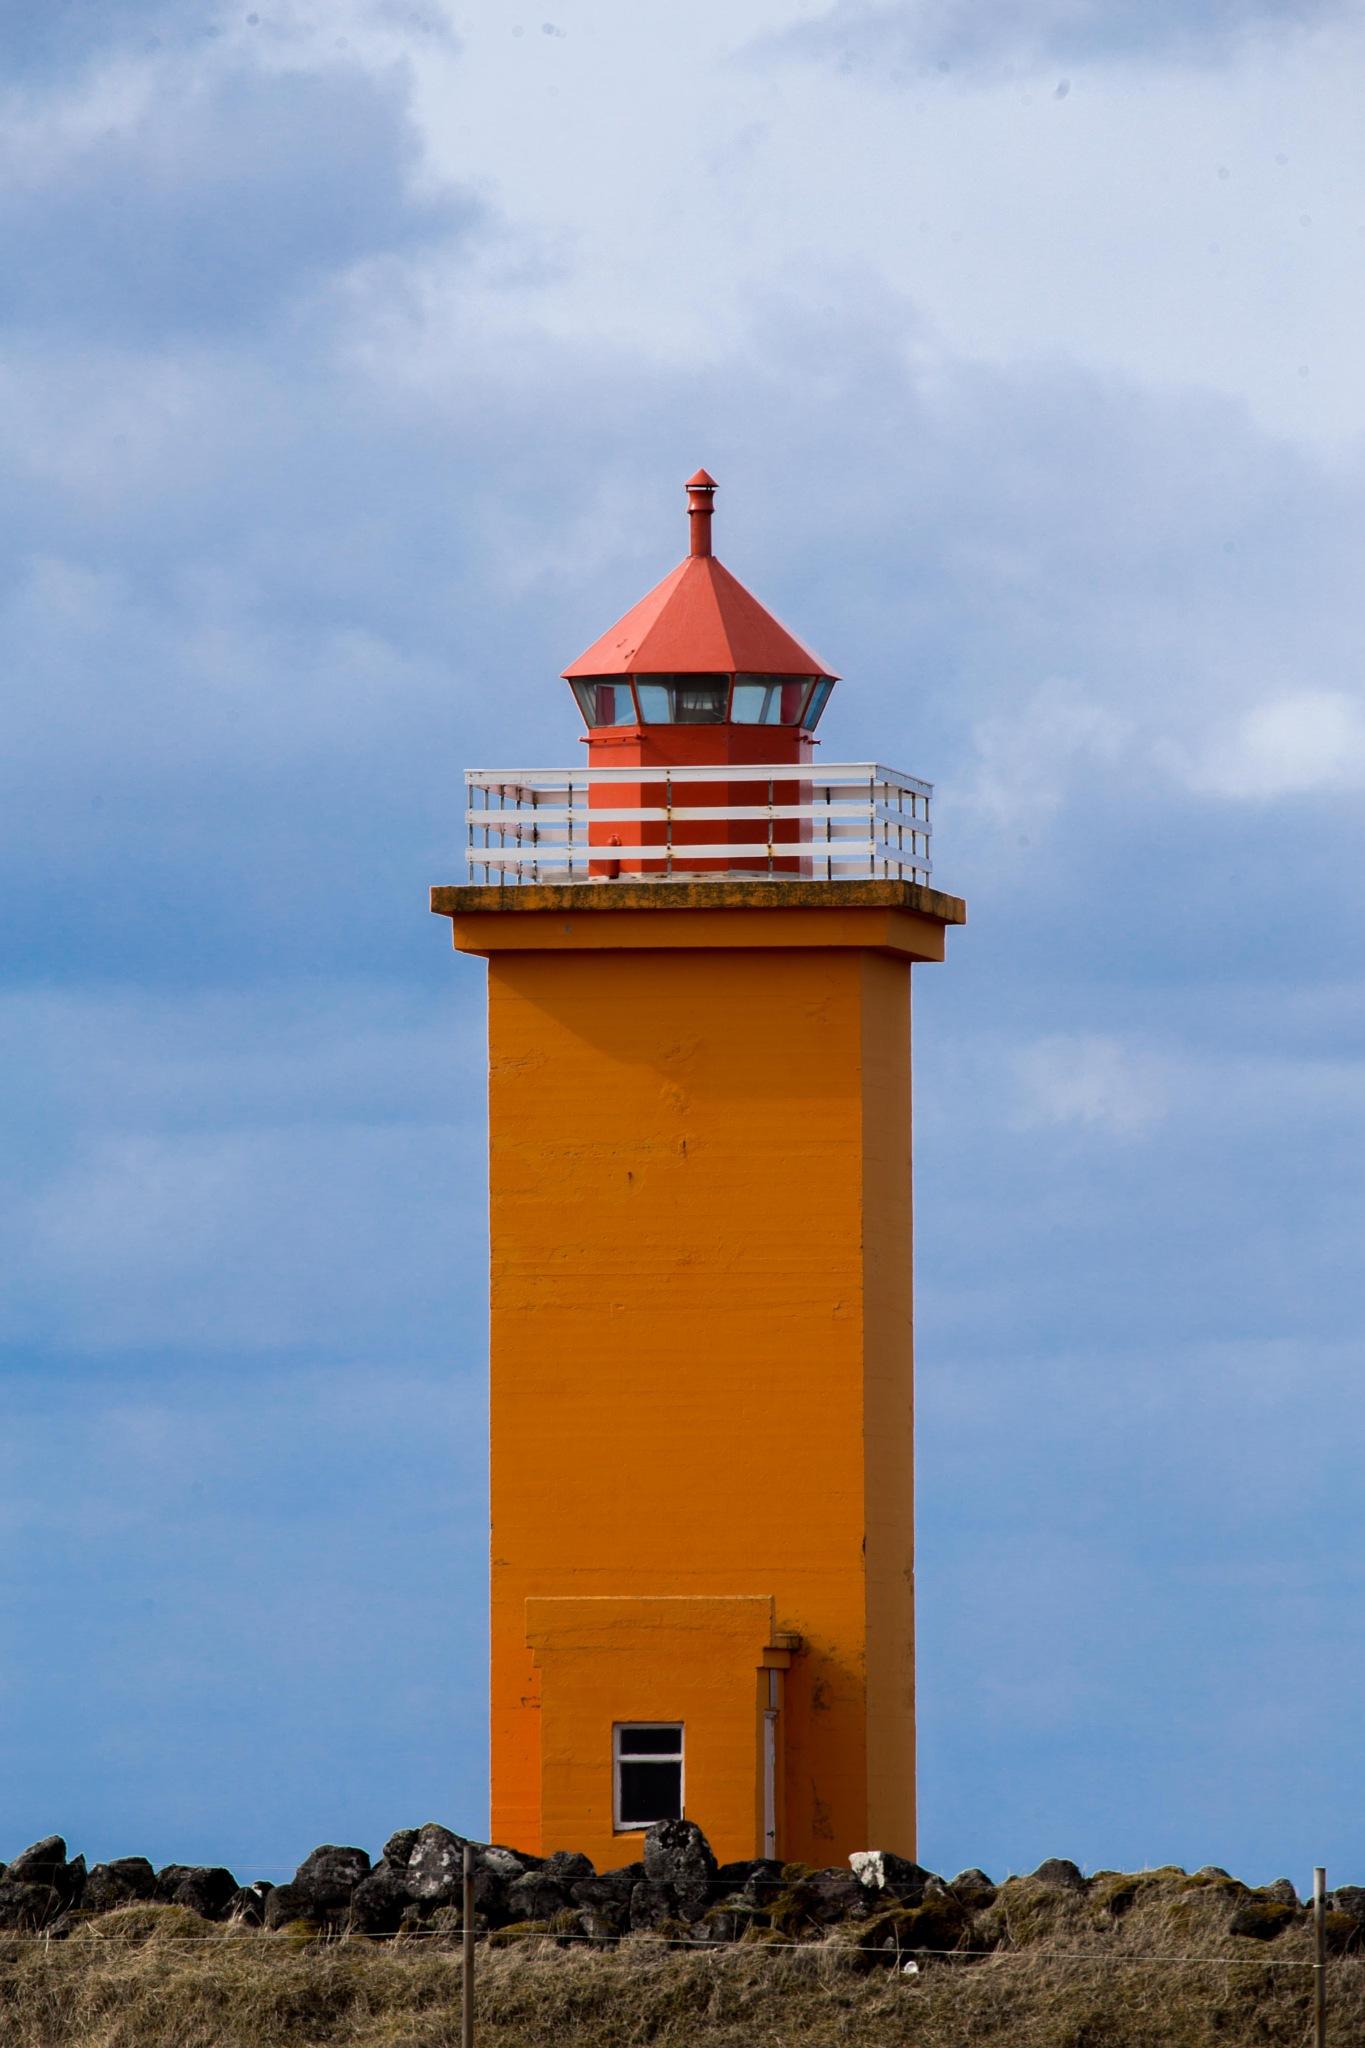 Orange Lighthouse by charles desrosiers